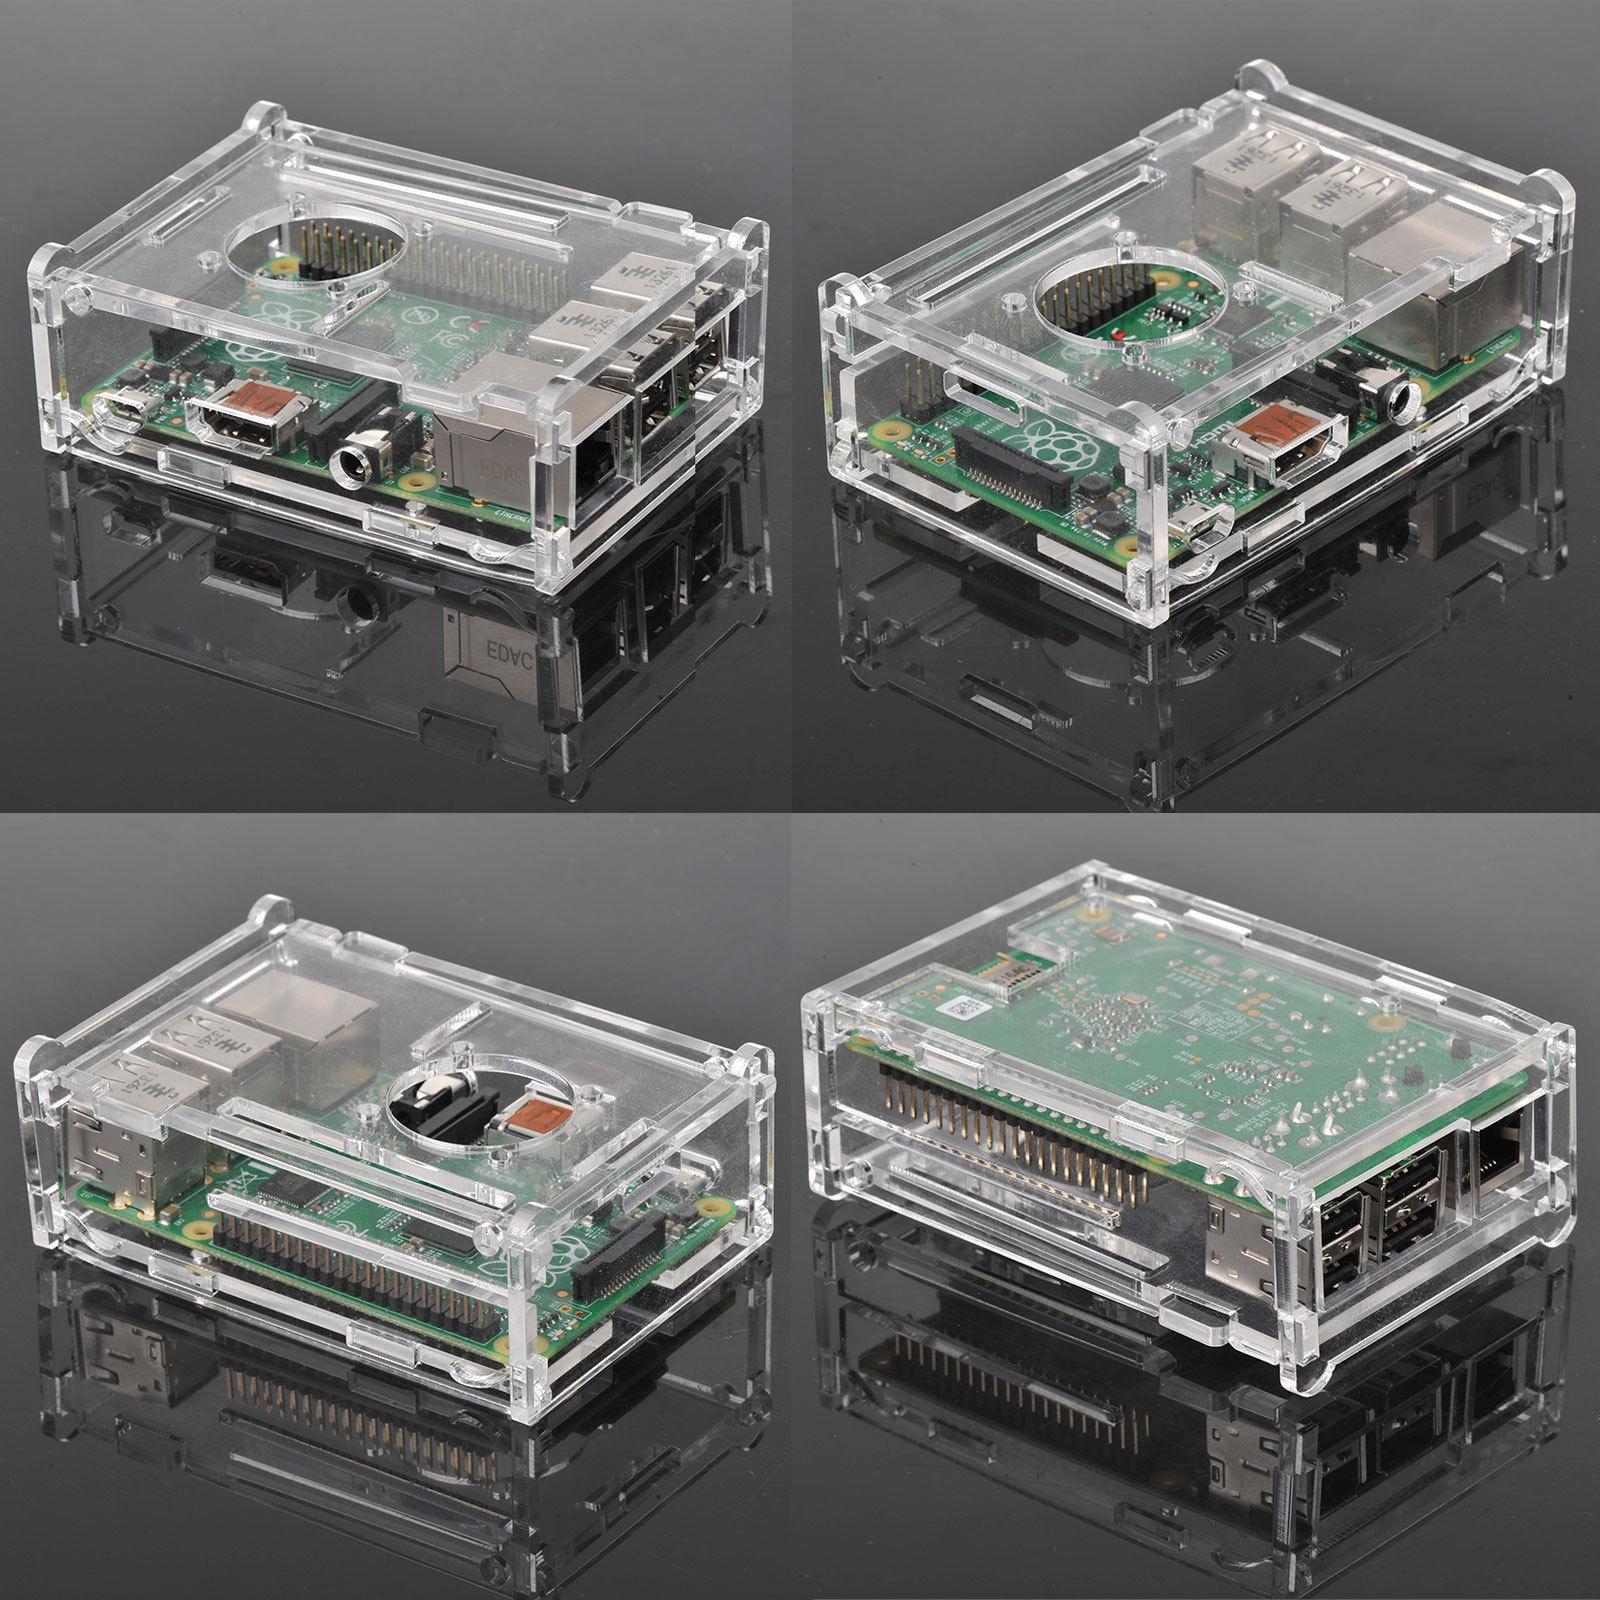 Cooling Fan Clear Case Enclosure Box Heatsink For Raspberry Pi B+//2//3 Model B